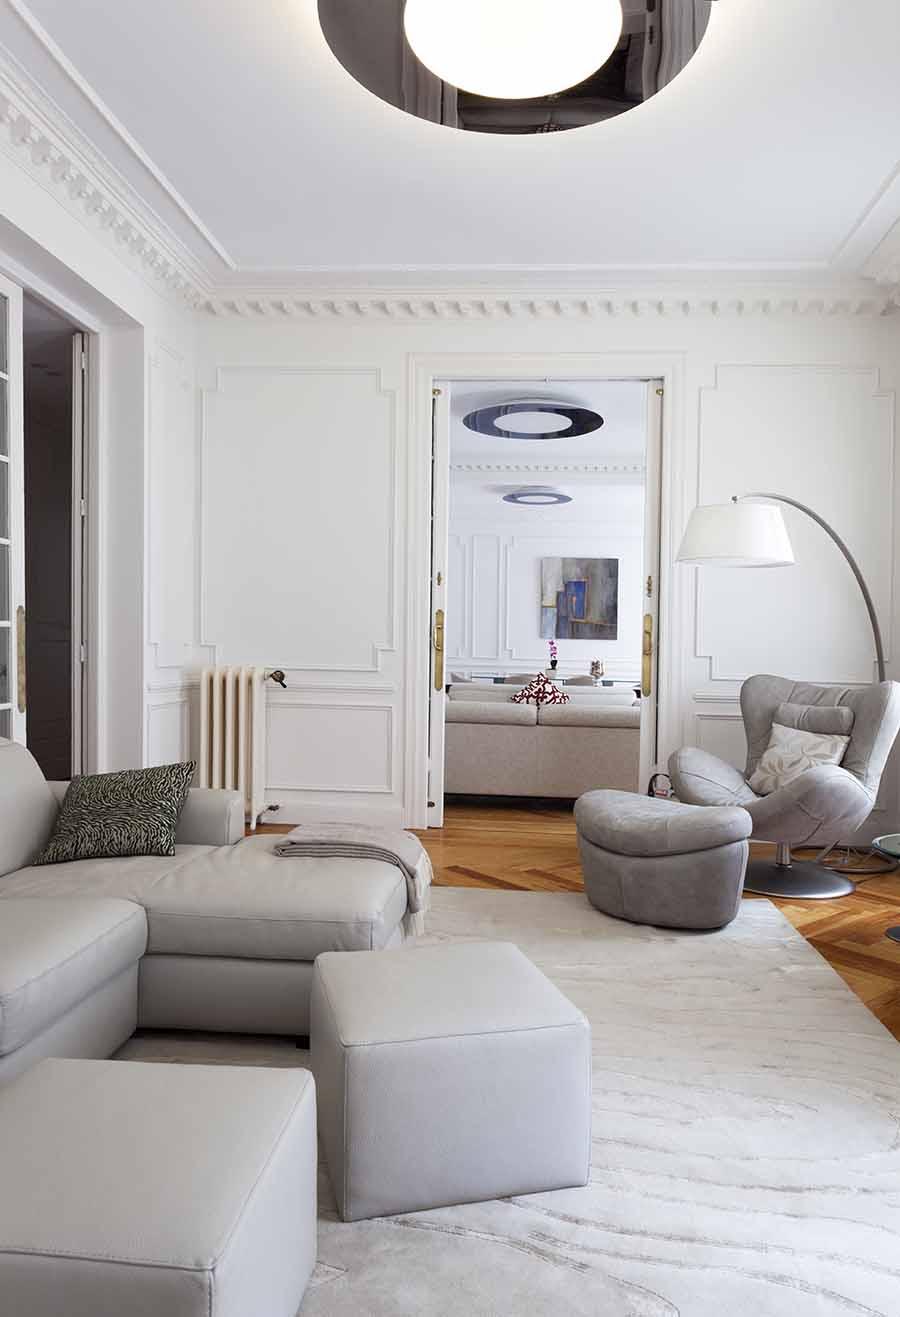 Alfonsoxi23 alicia mesa dise adora de interiores y for Disenadora de interiores